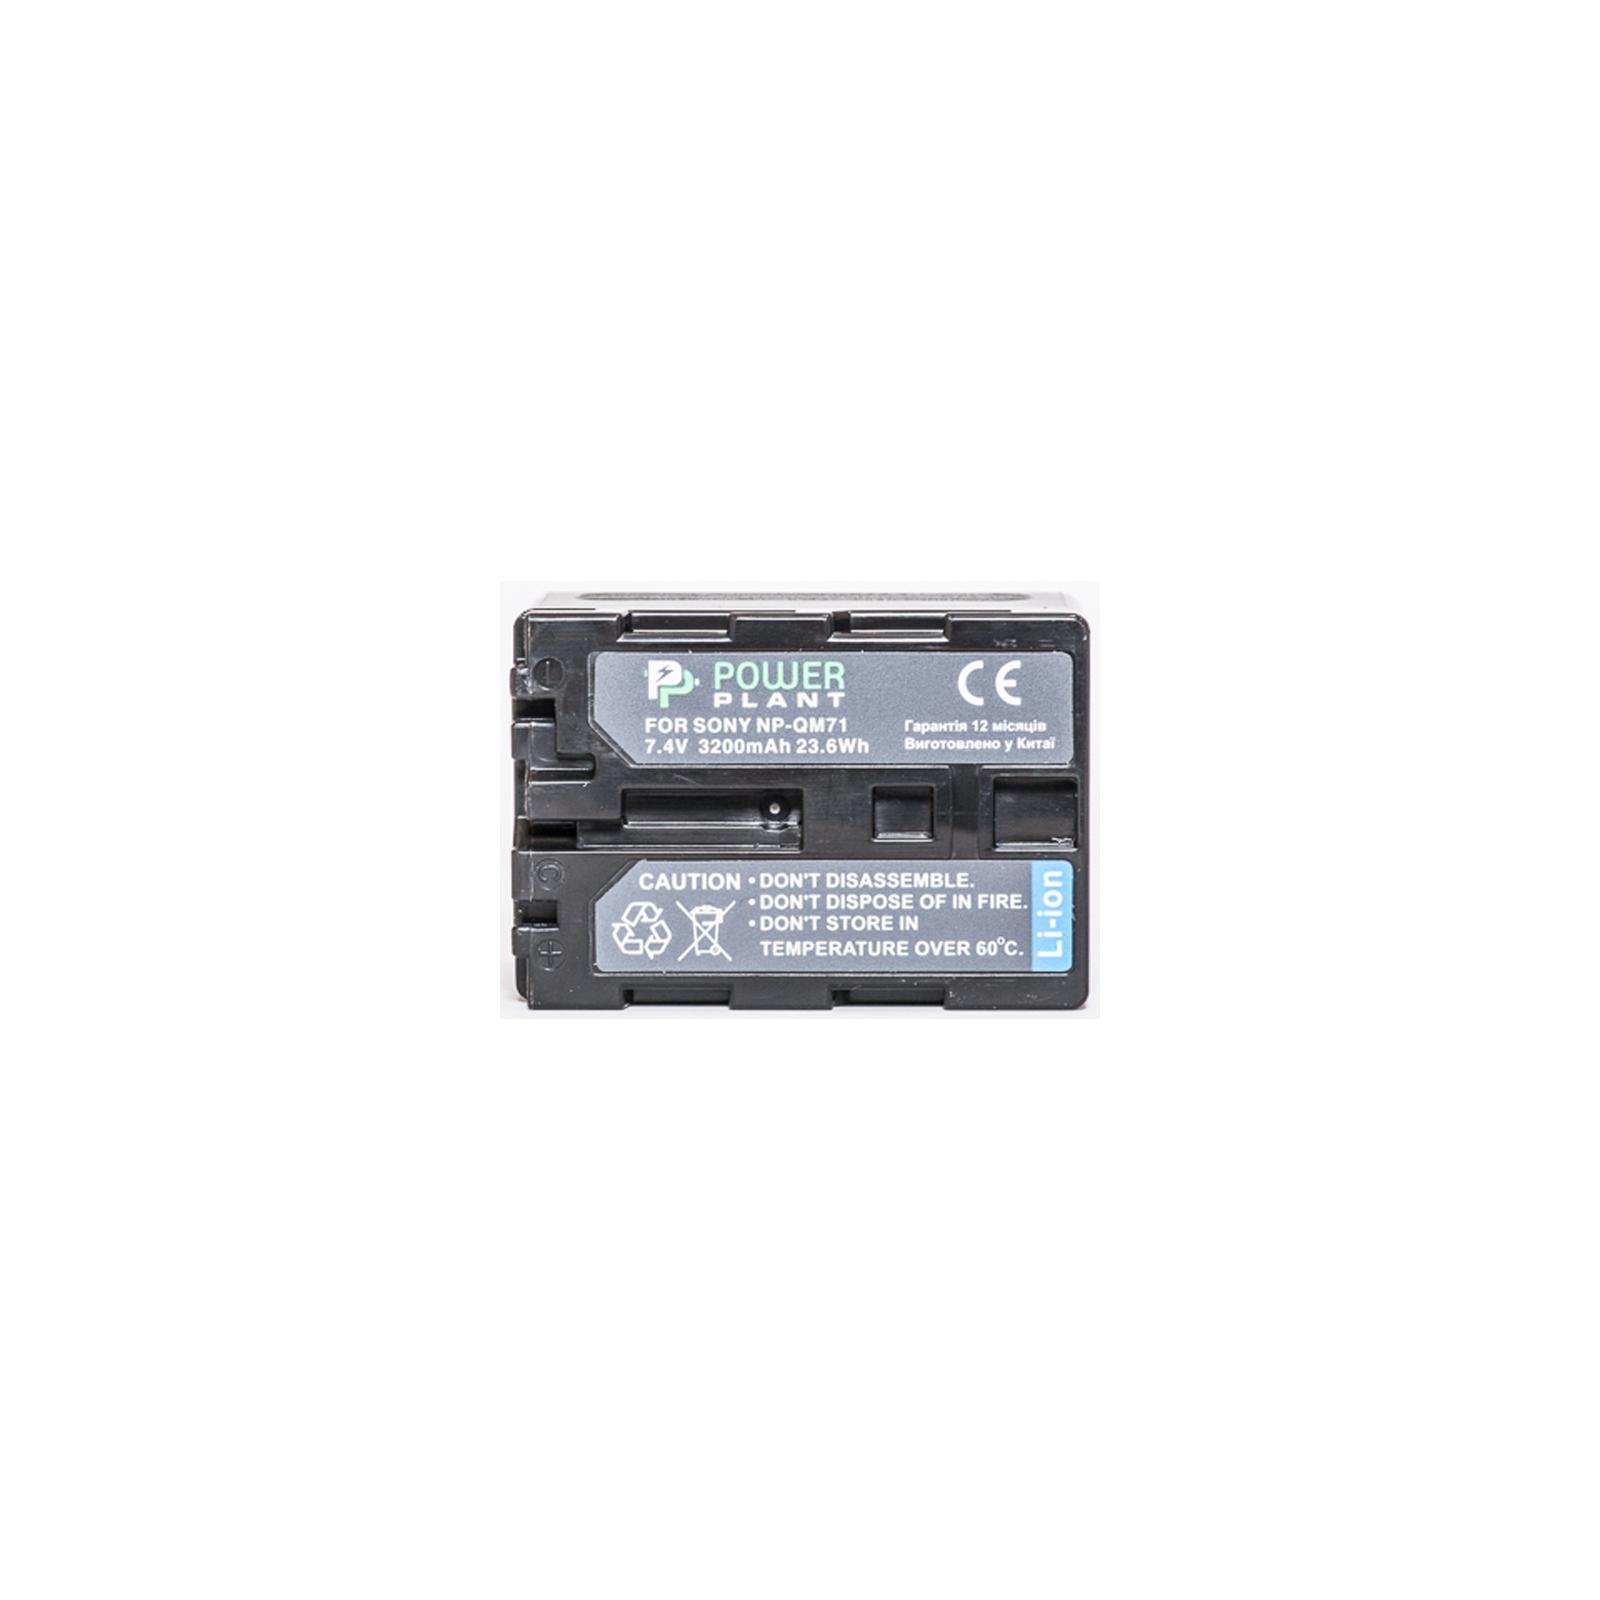 Аккумулятор к фото/видео PowerPlant Sony NP-FM70/QM71 (DV00DV1029) изображение 2